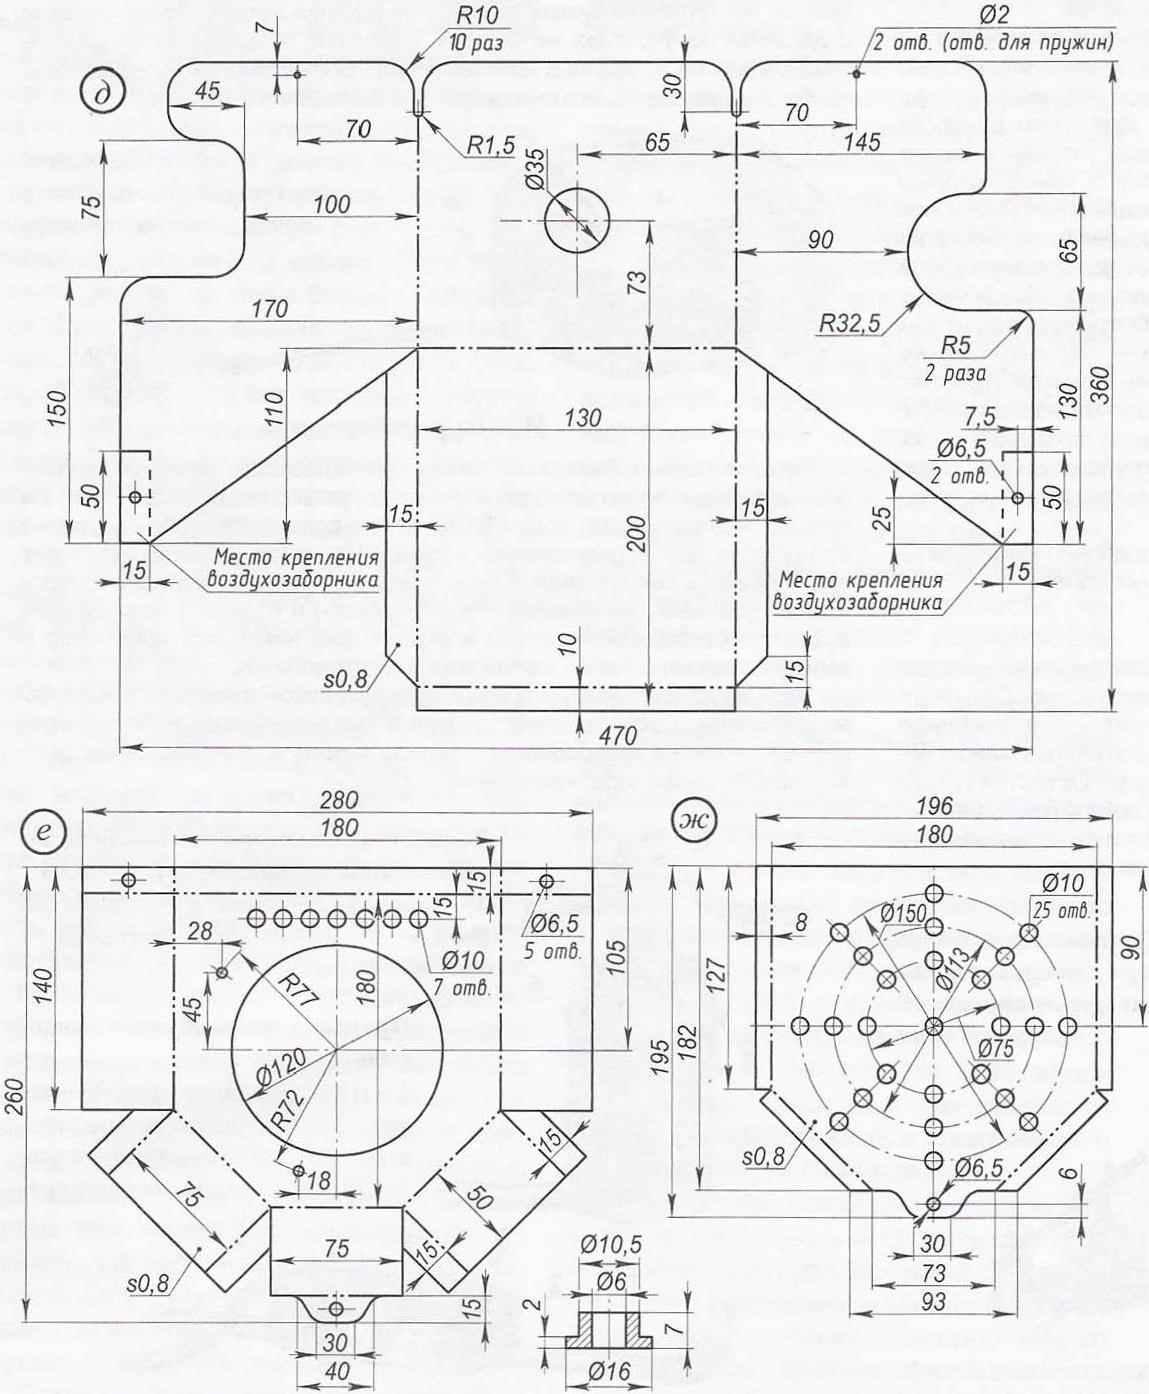 Детали вентилятора воздушного охлаждения цилиндра